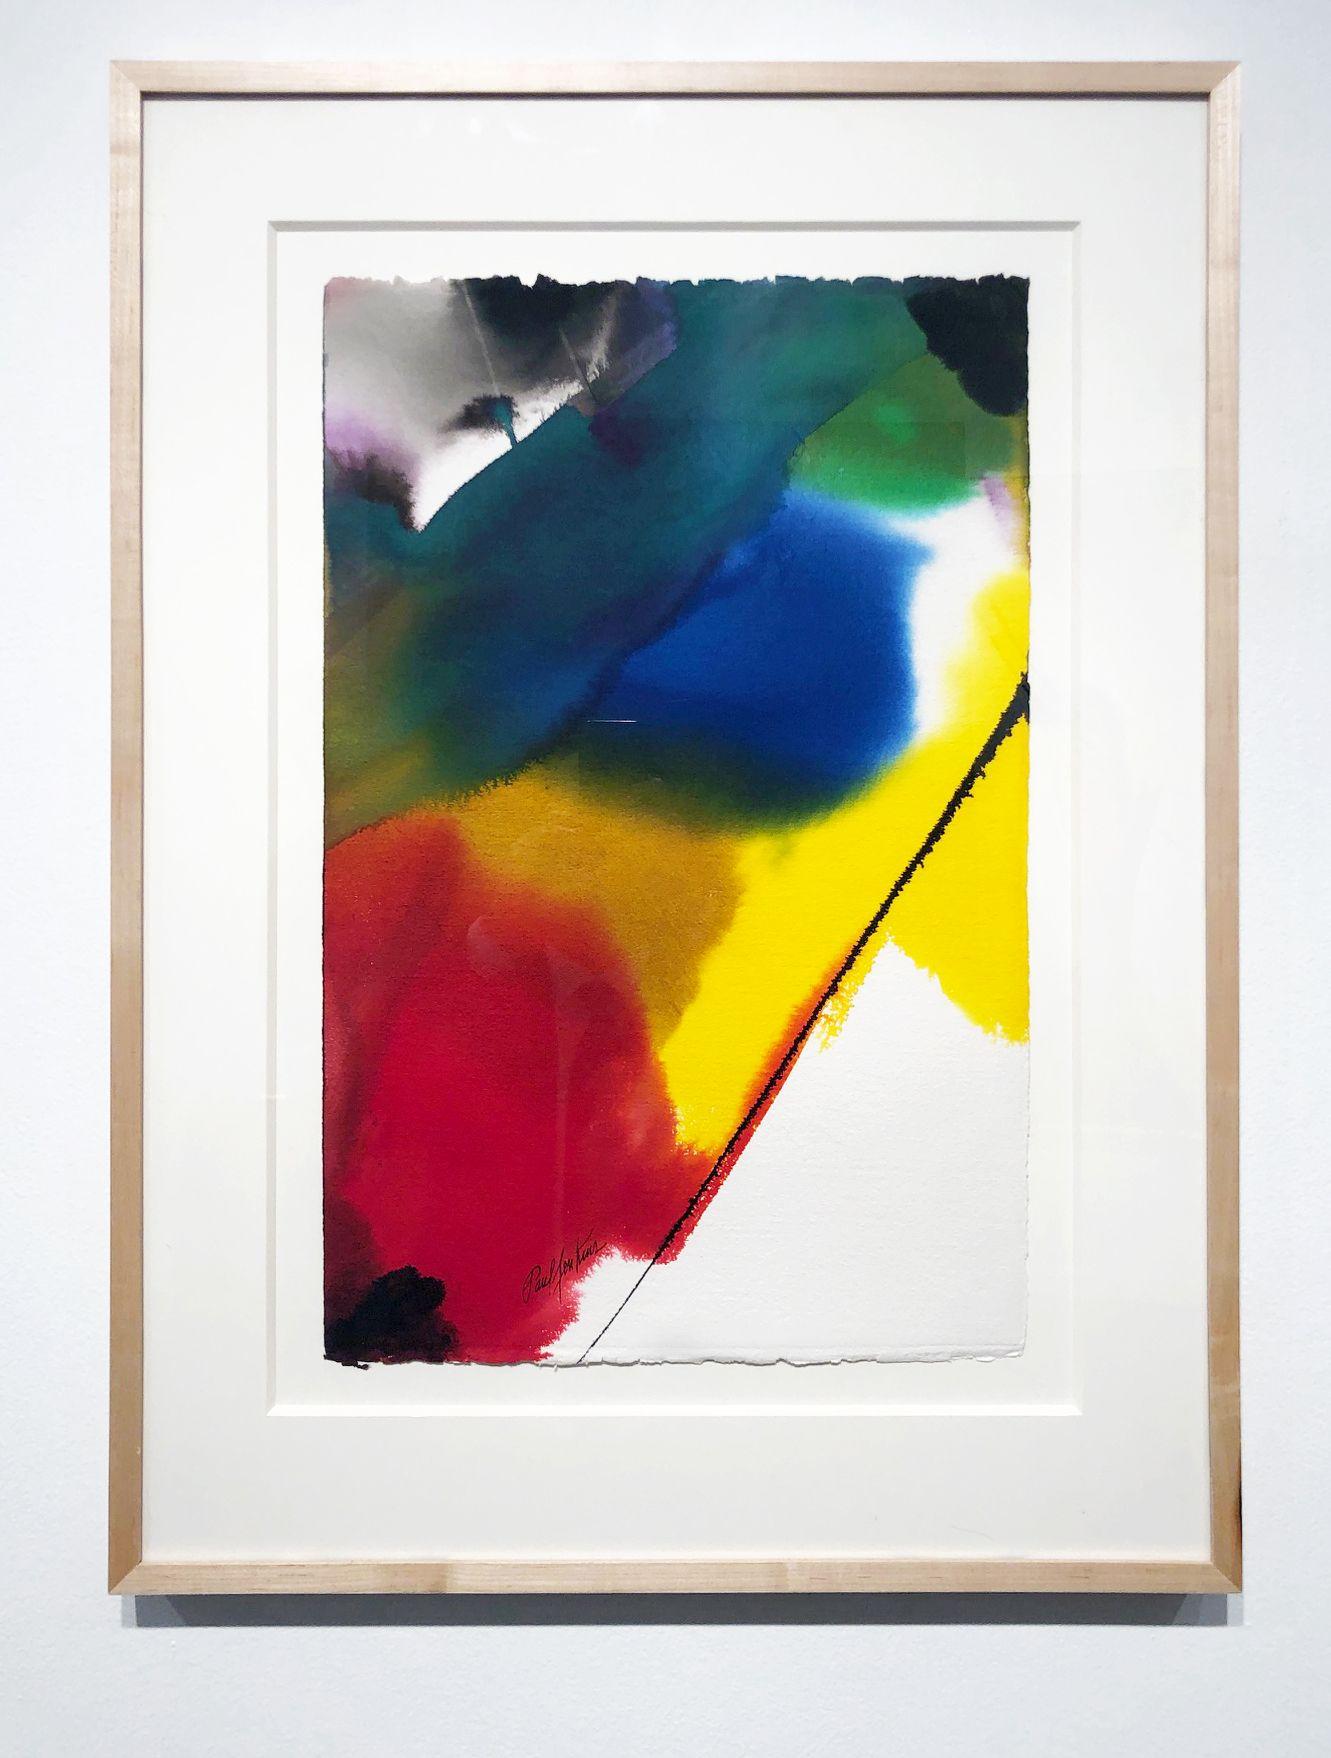 Paul Jenkins, Phenomena Glide Prism, 1988